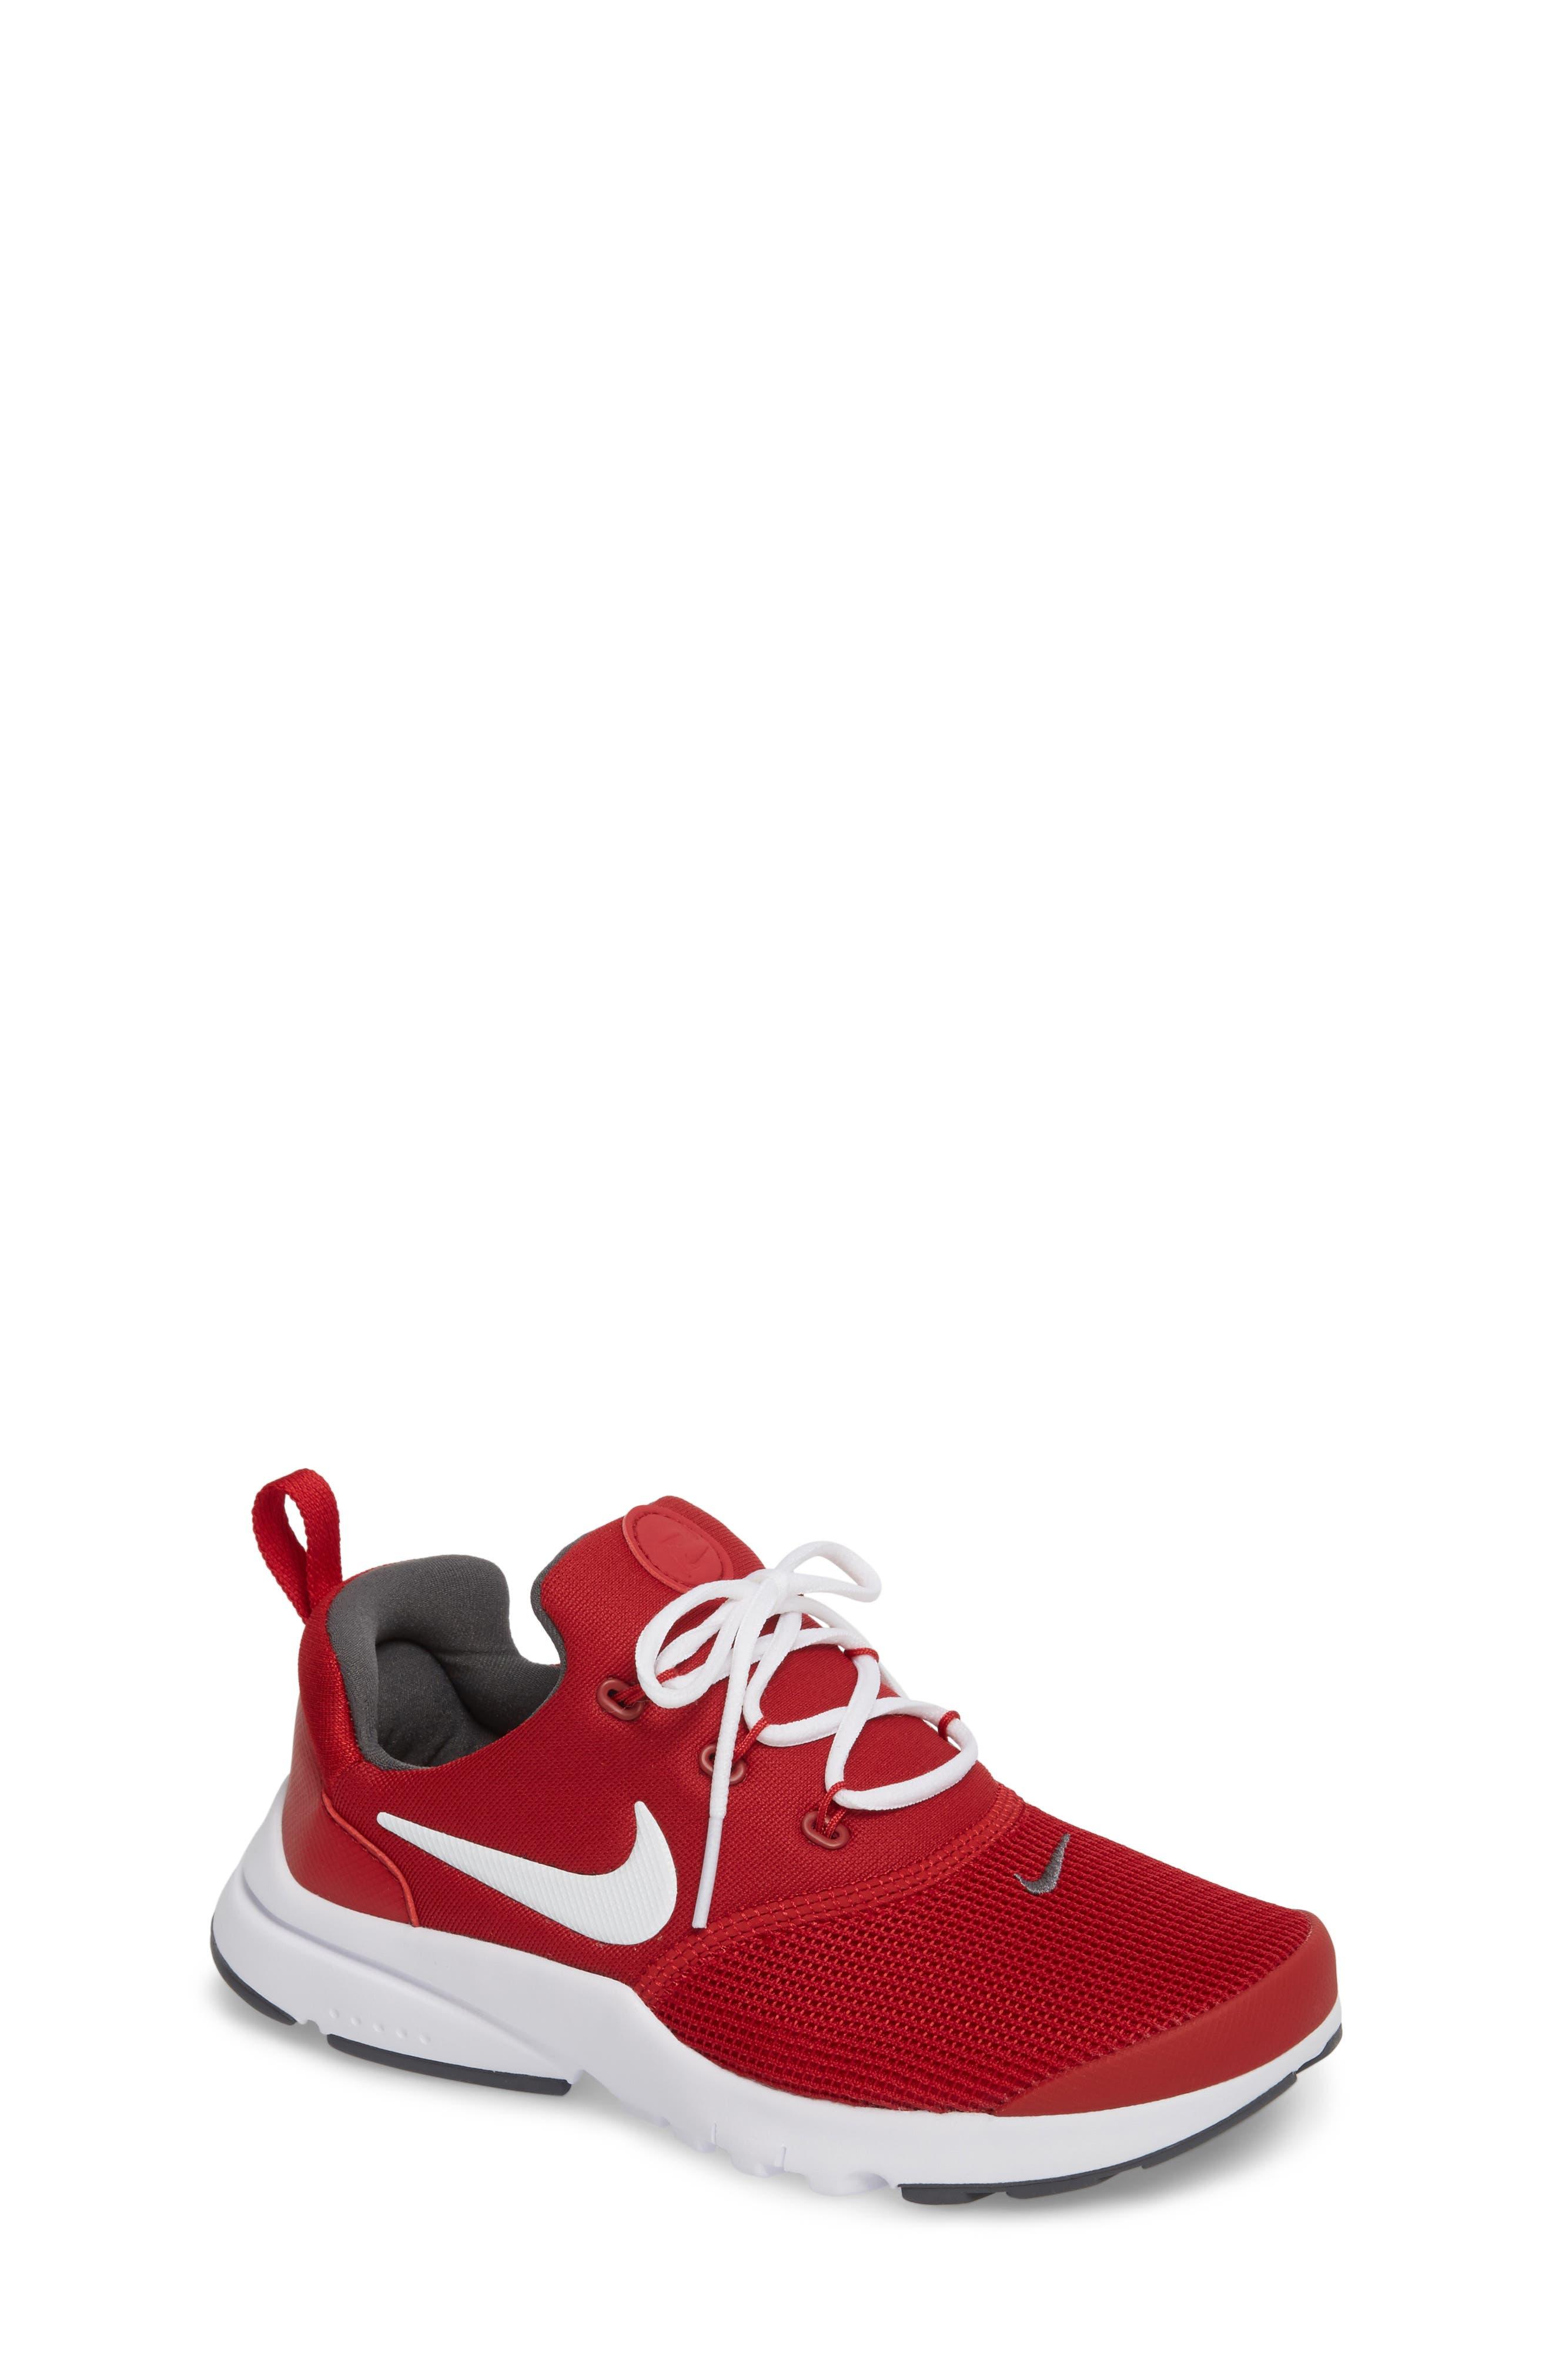 Presto Fly Sneaker,                             Main thumbnail 1, color,                             Gym Red/ Dark Grey/ White